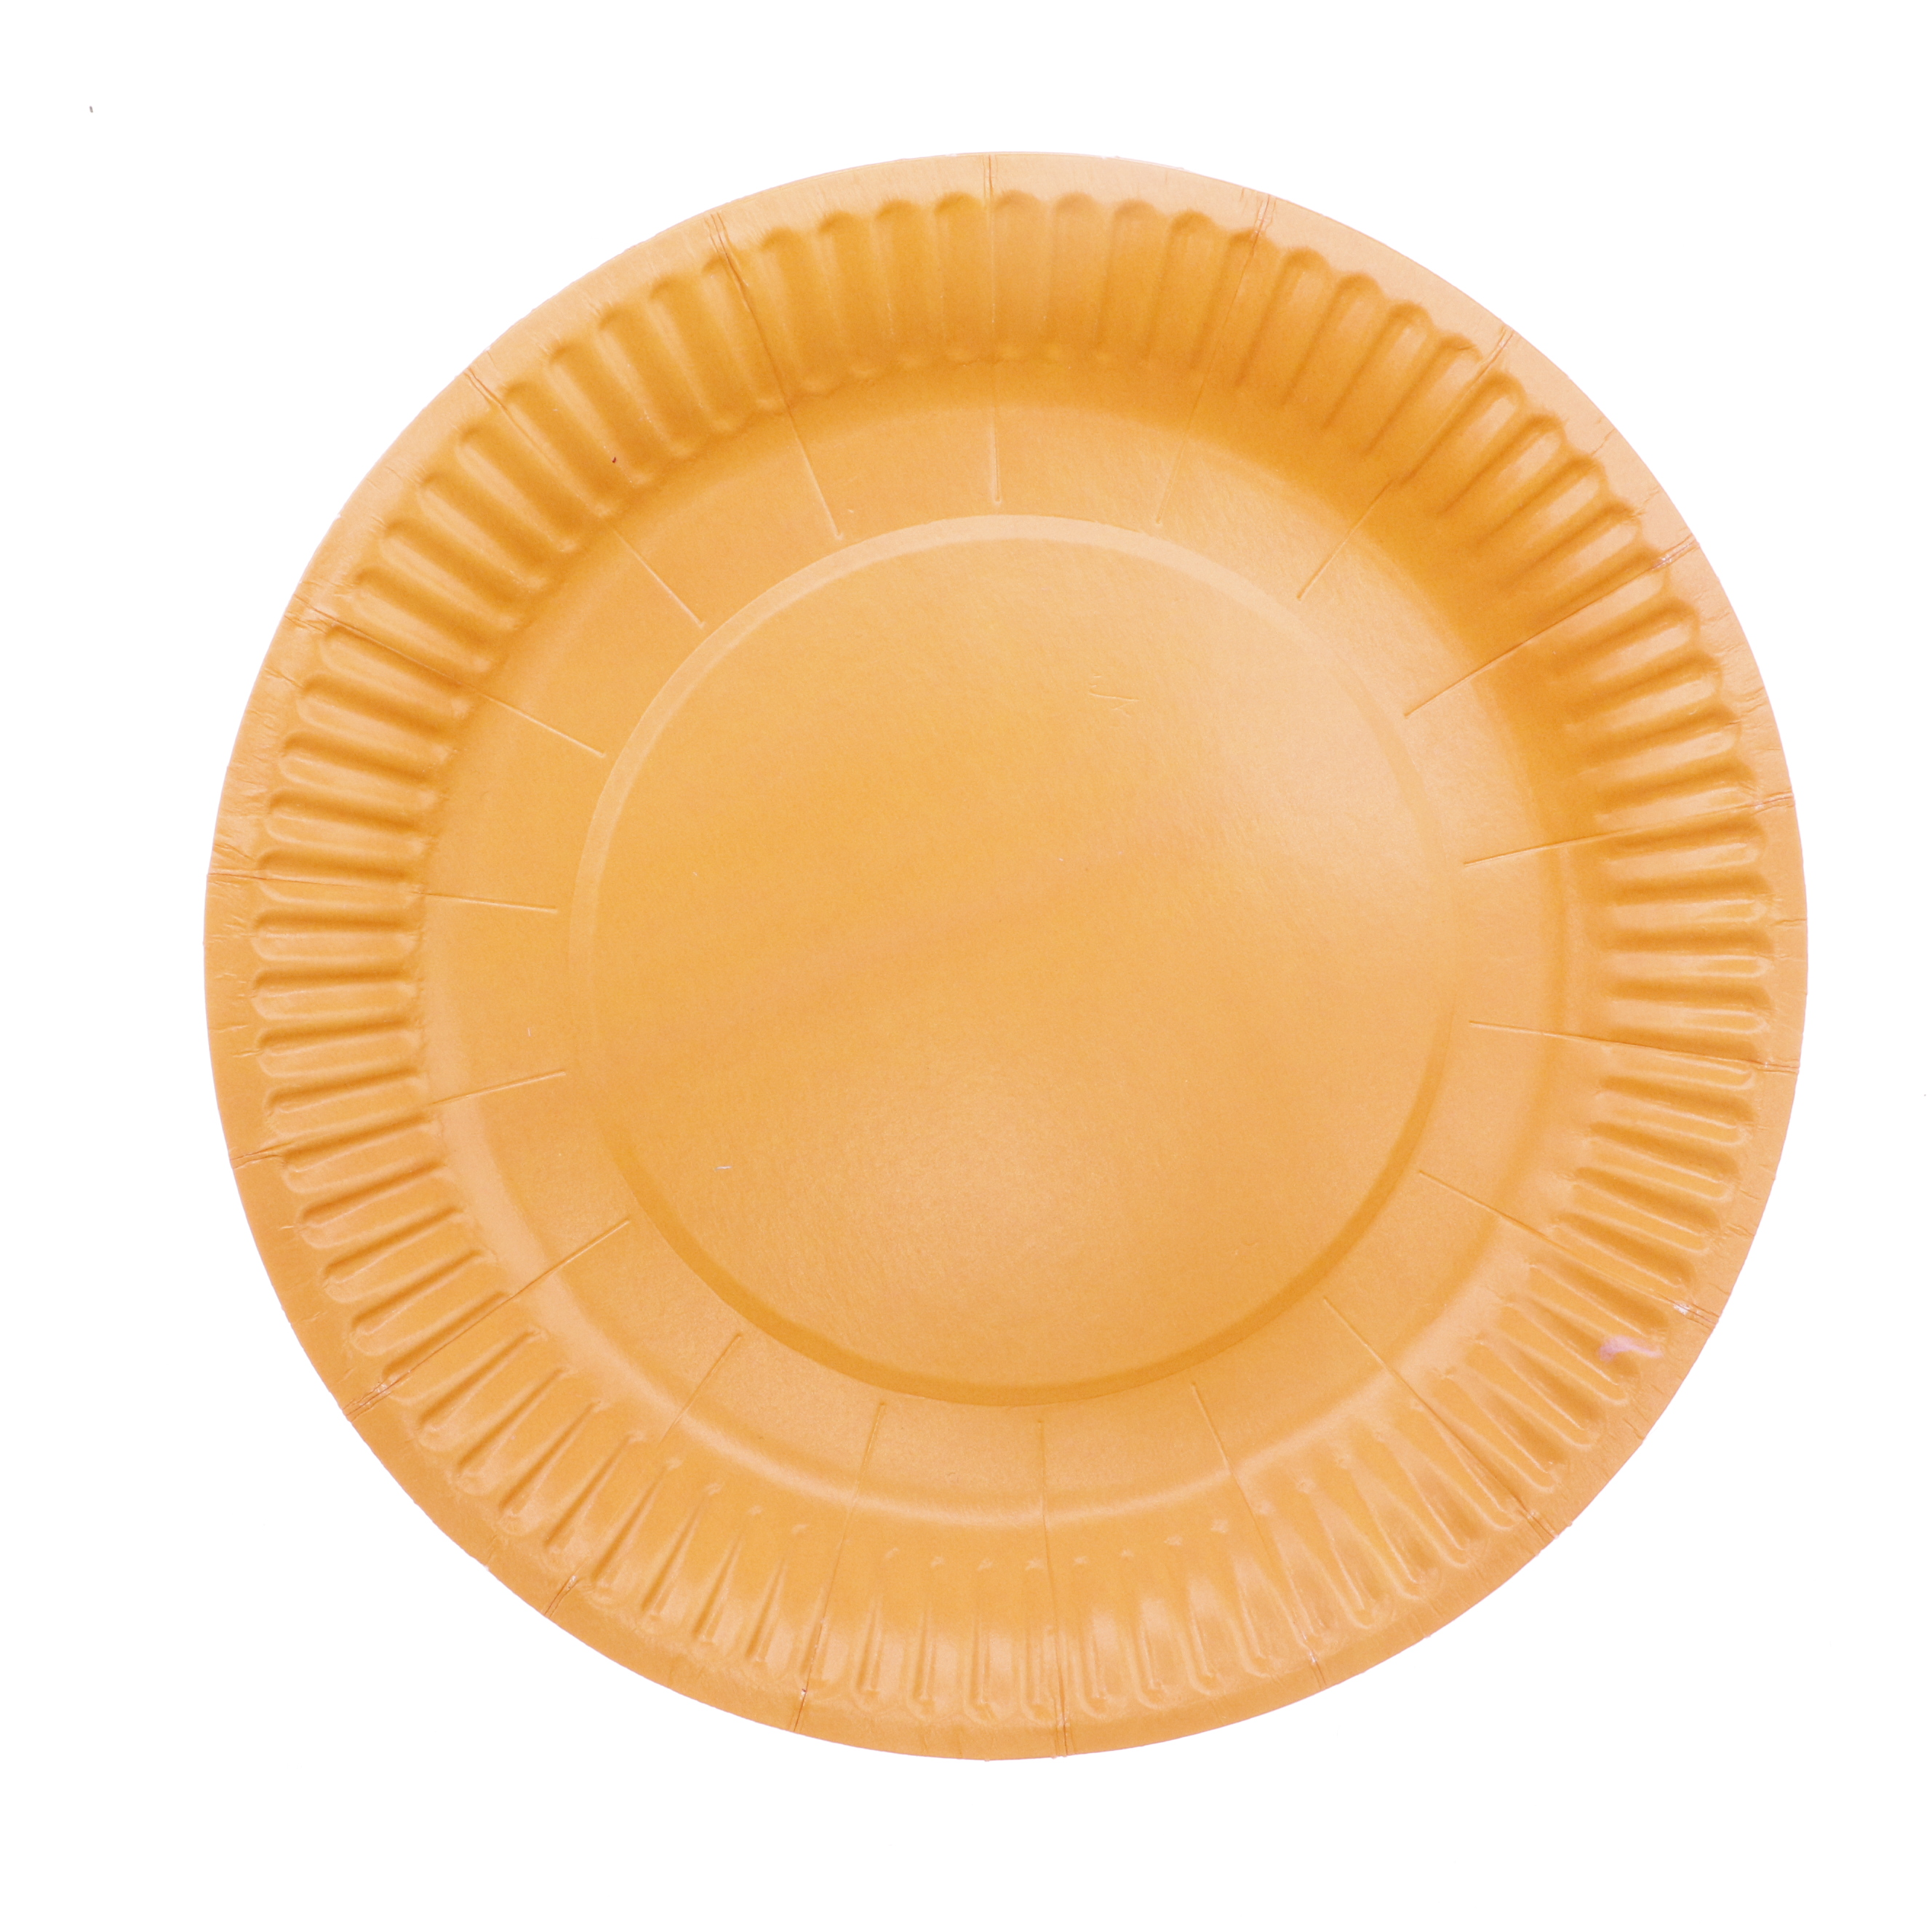 Купить с кэшбэком 20Pcs 7inch Disposable Tableware Set Disposable Paper Plate Fruit Plate Cake Tray Wedding Birthday Decoration Party Supplies